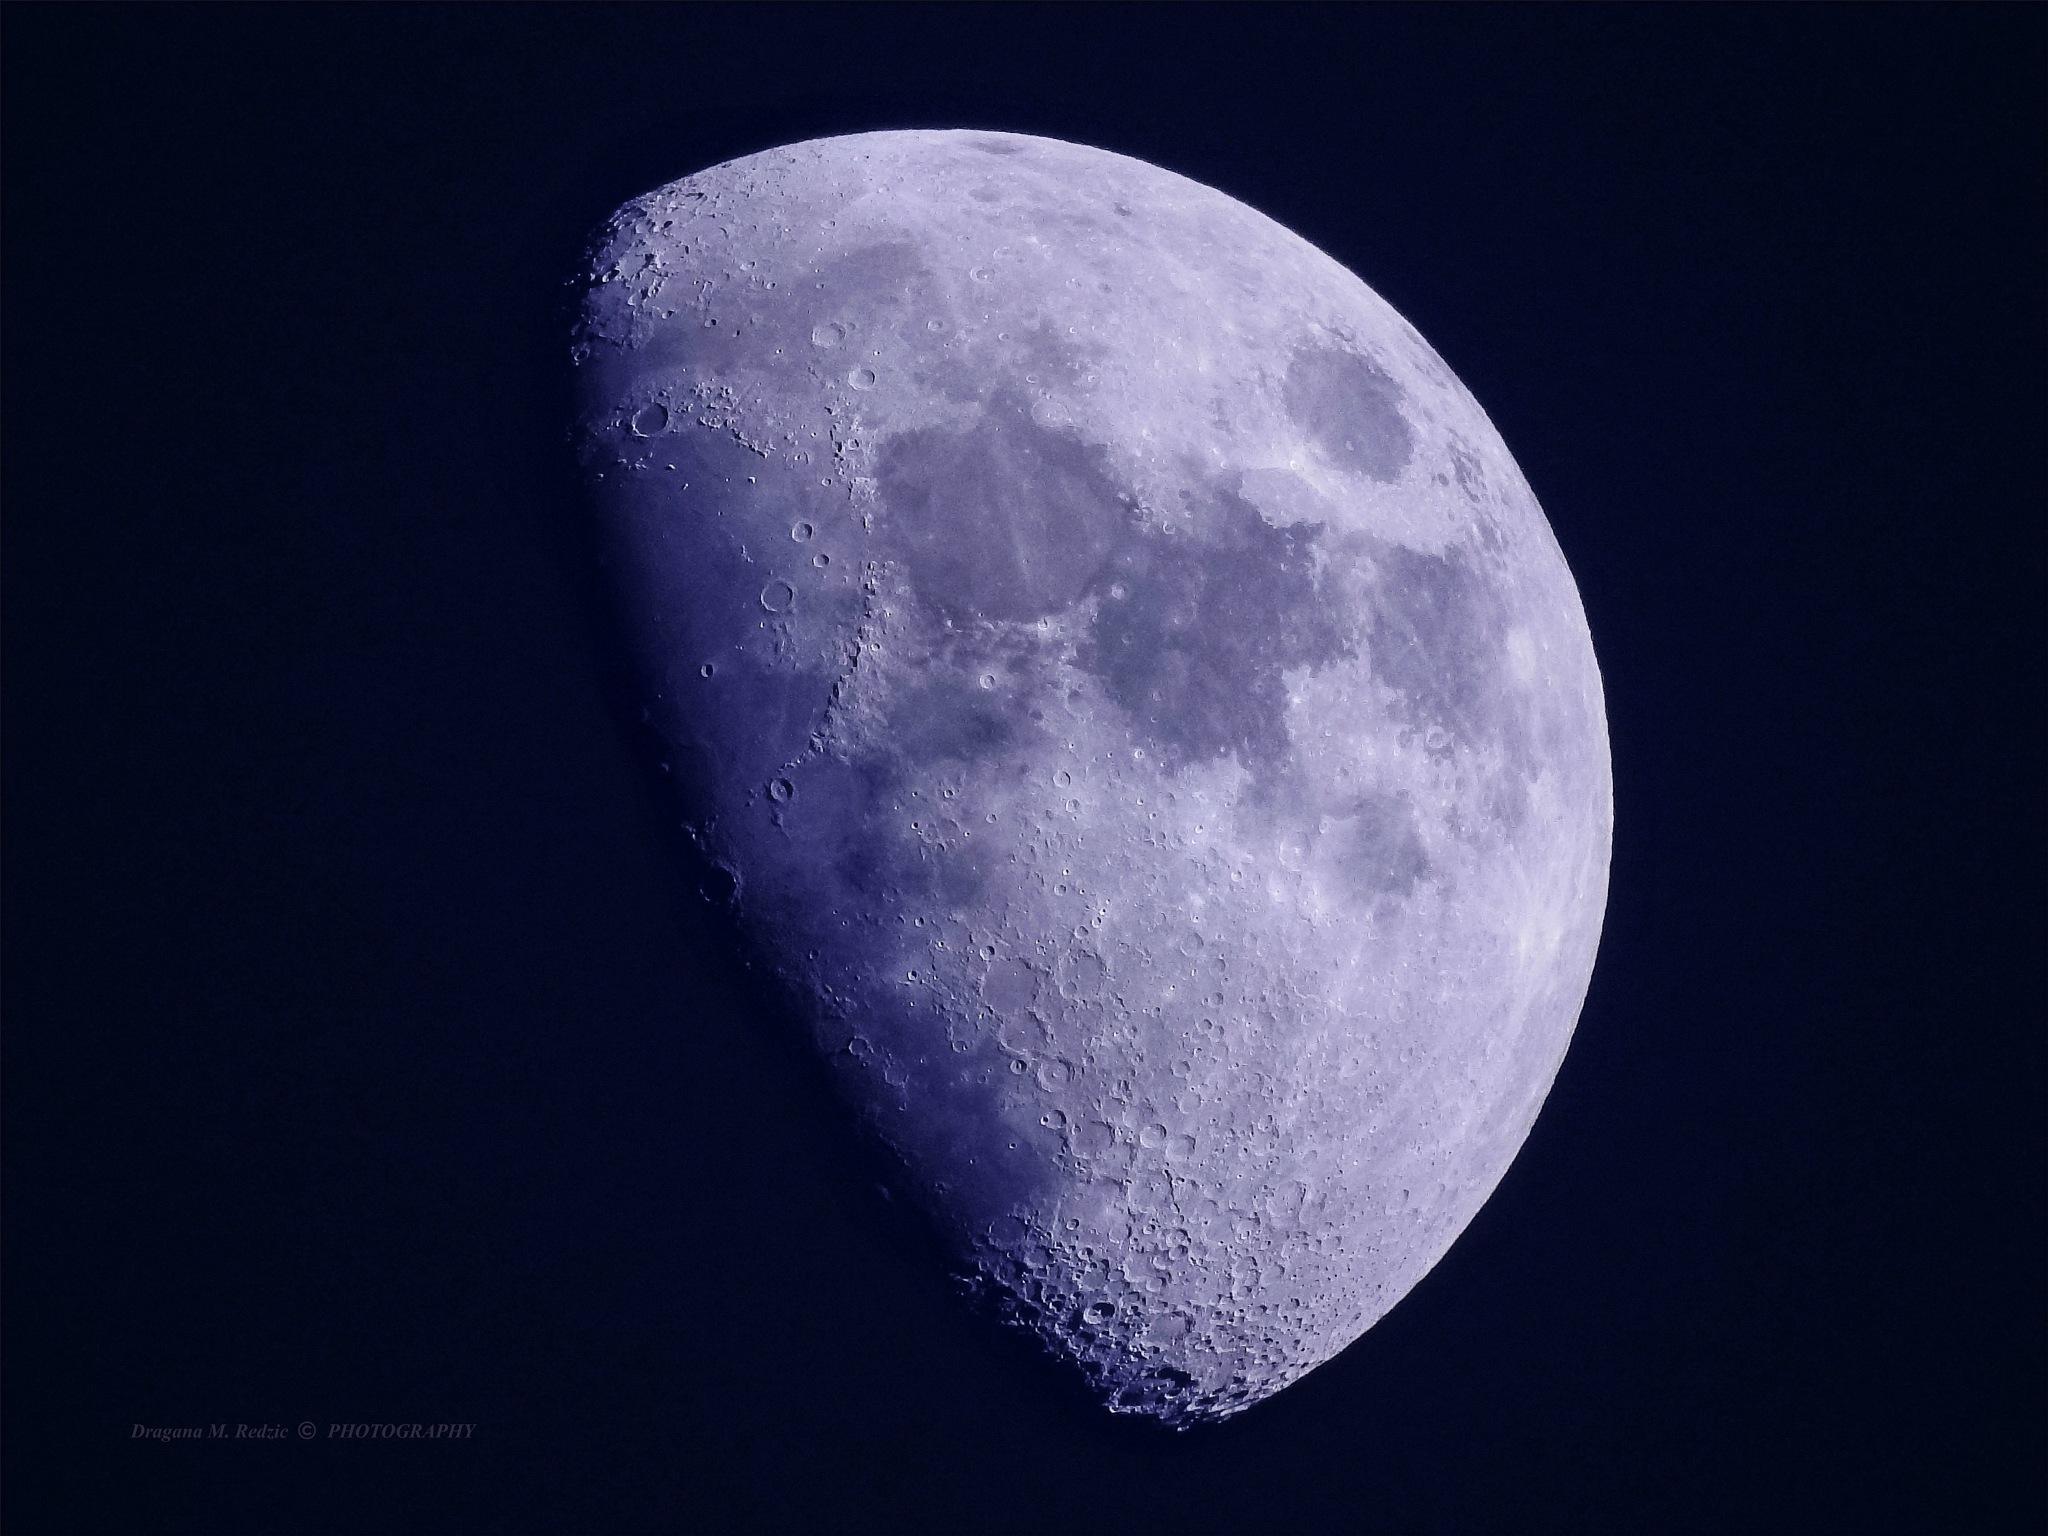 Violet Moon - White Balance: Fluorescent 1 by Драгана М. Реџић